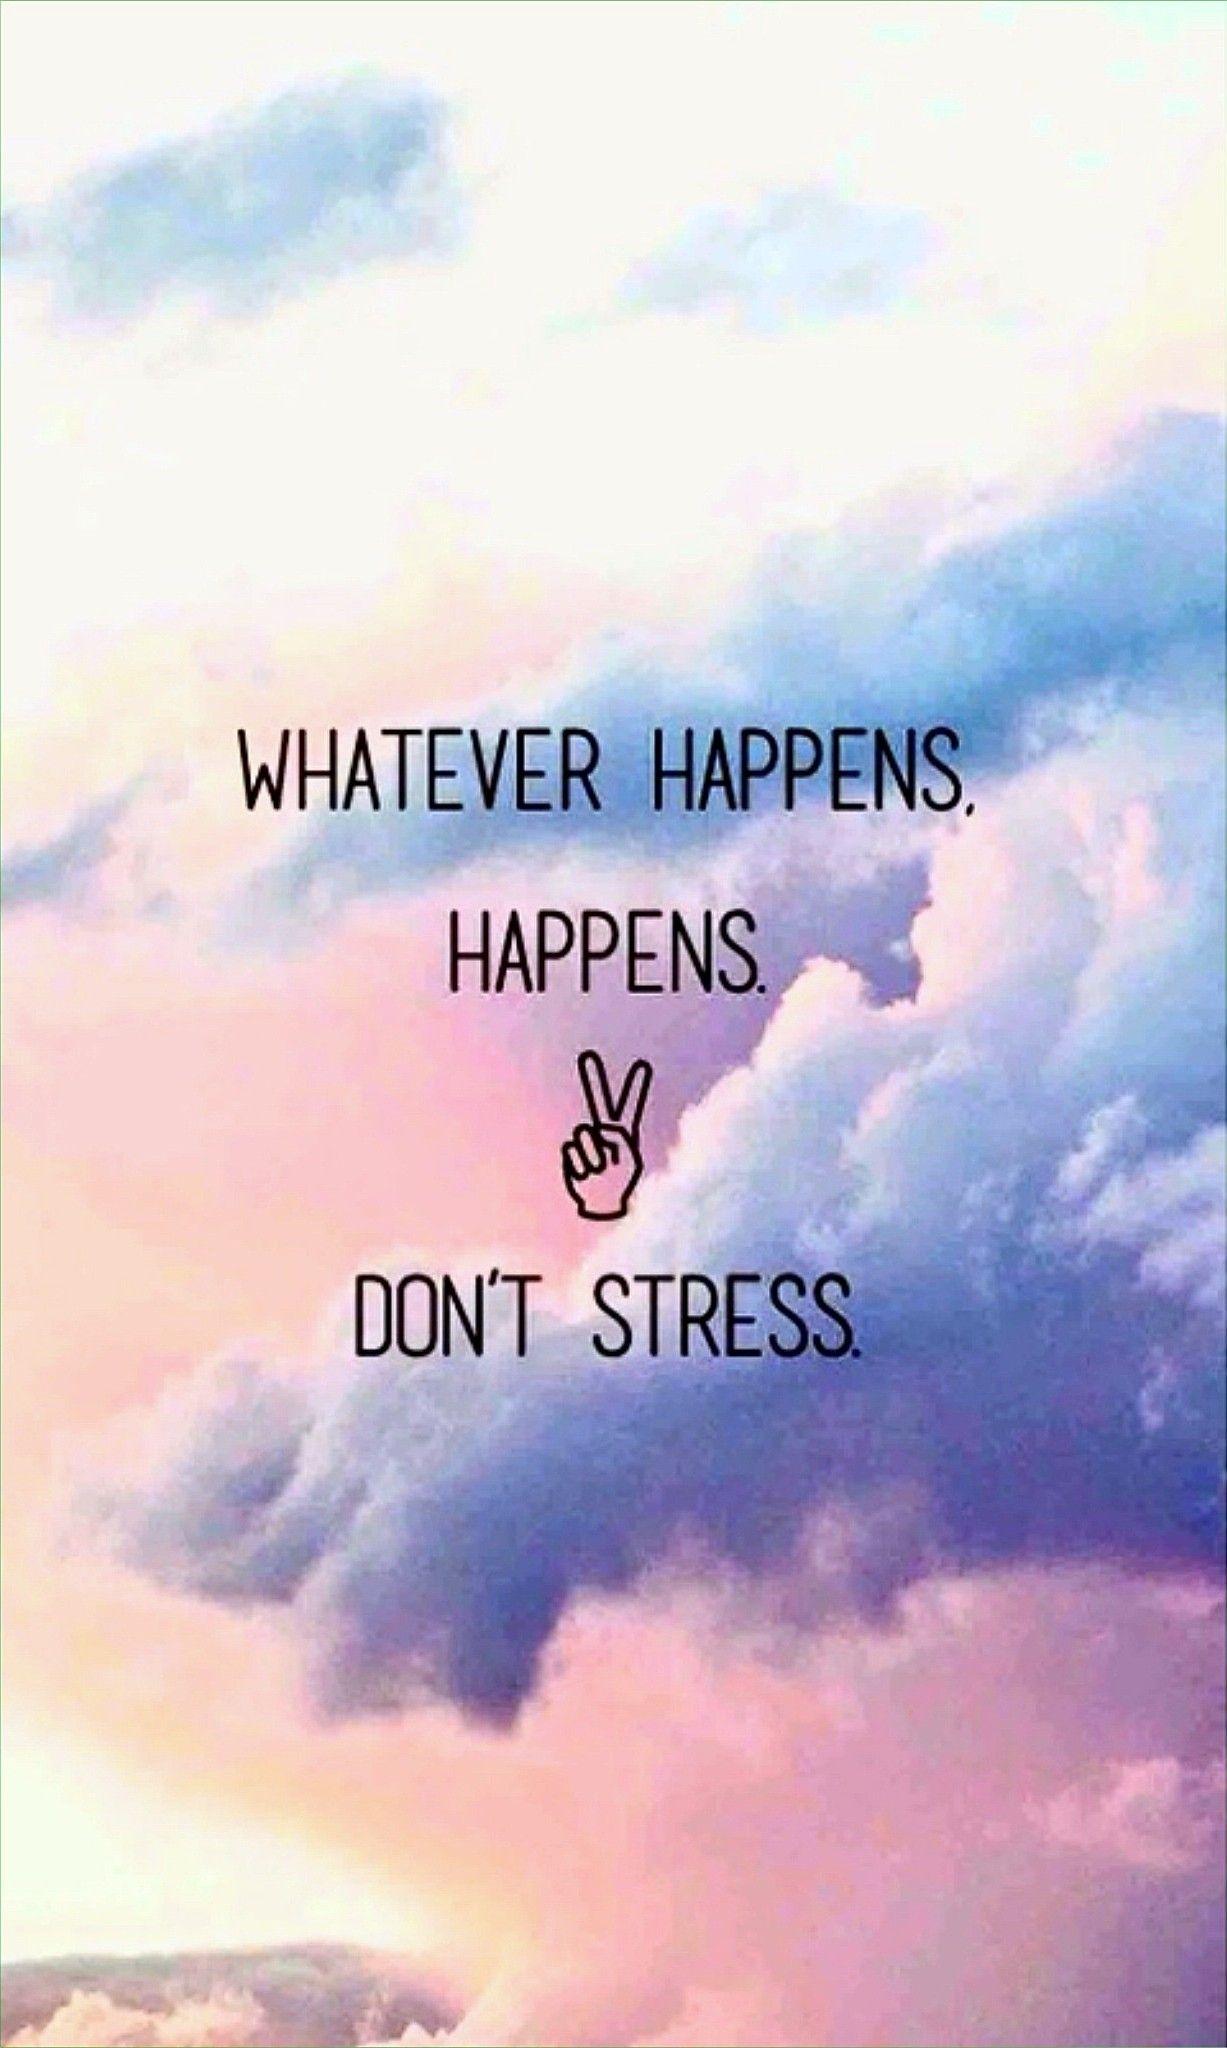 Exactly...whatever Happenes Happenes